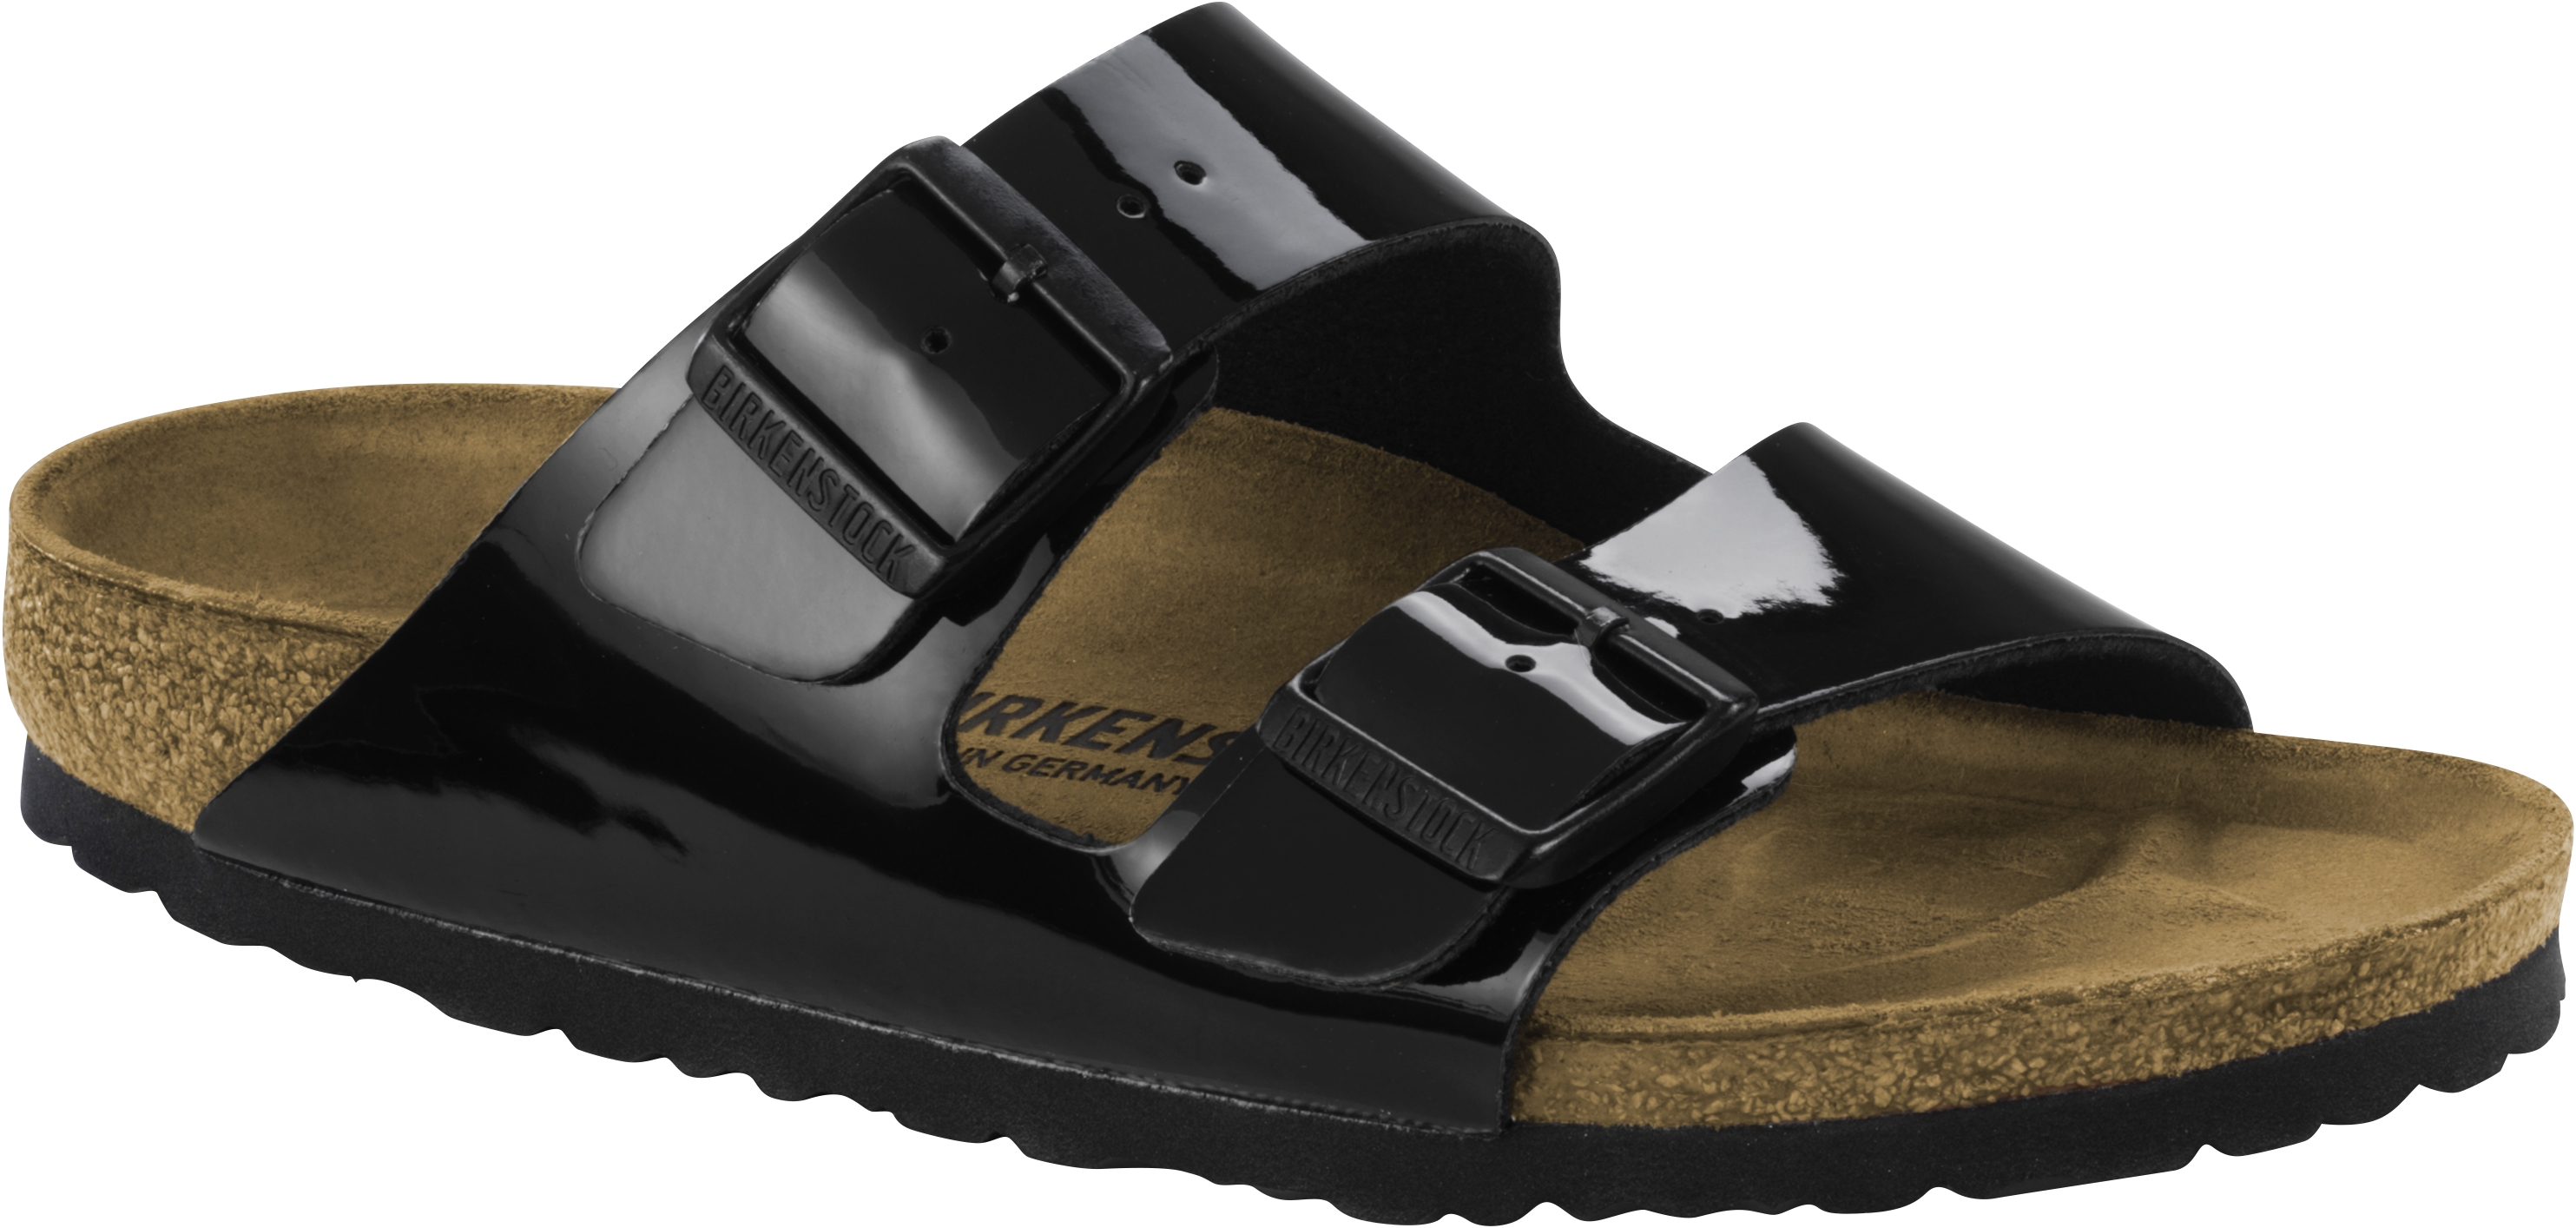 Birkenstock Pantolette Arizona schwarz lack BF Gr. 35 43 1005292